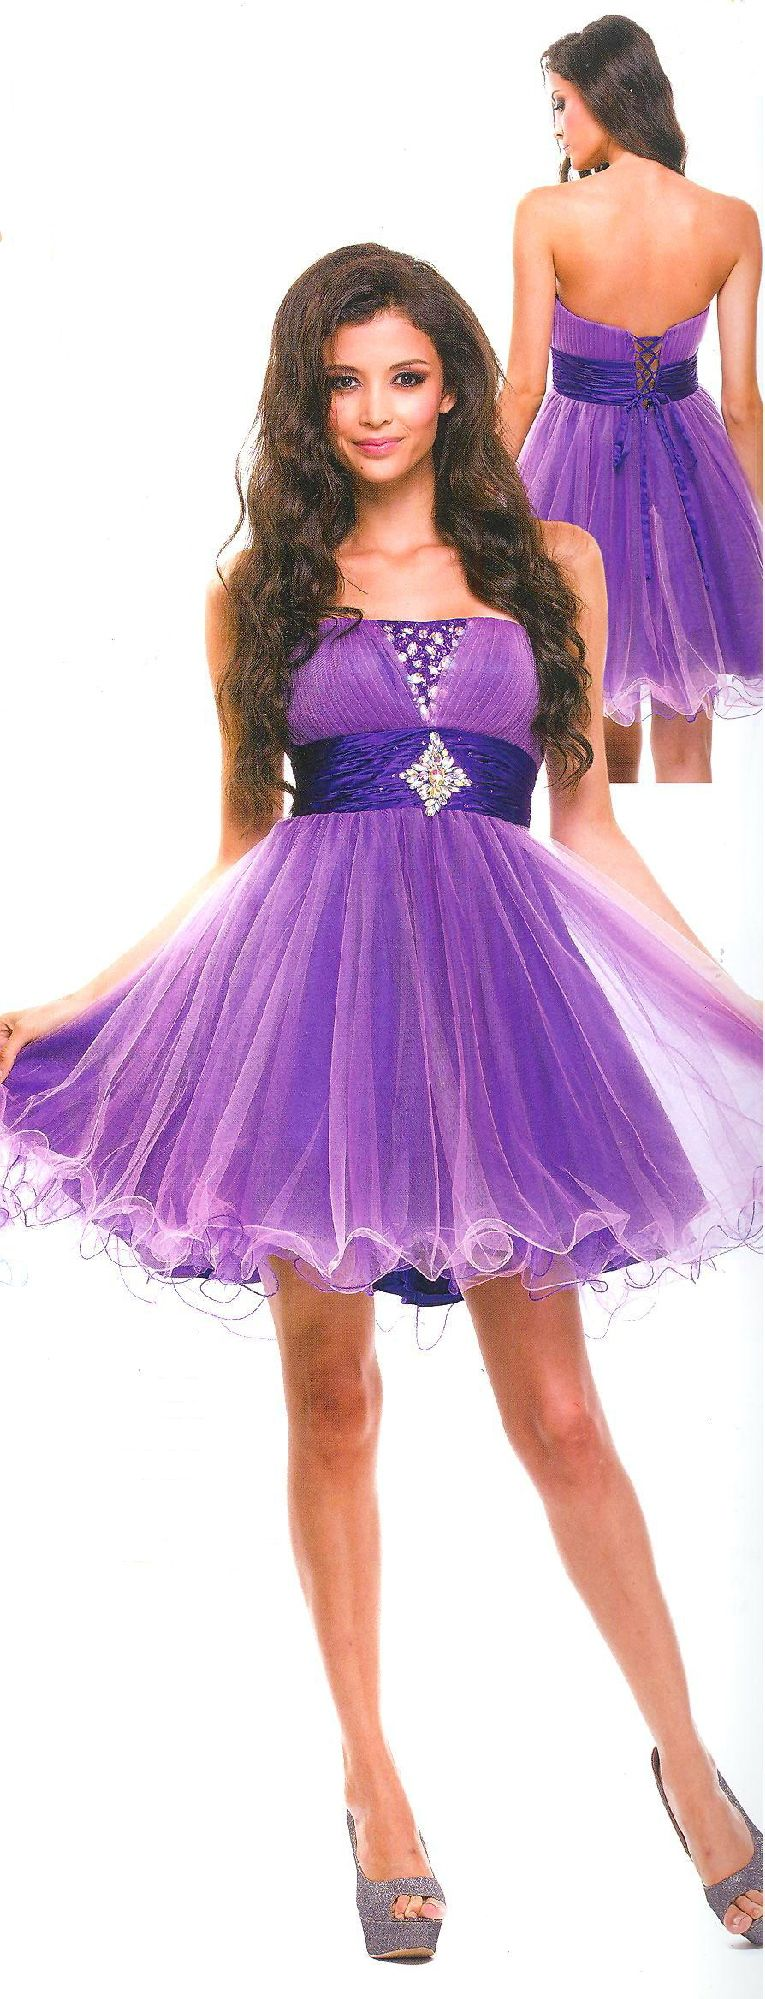 Prom dresswinter ball dress under star stepping just